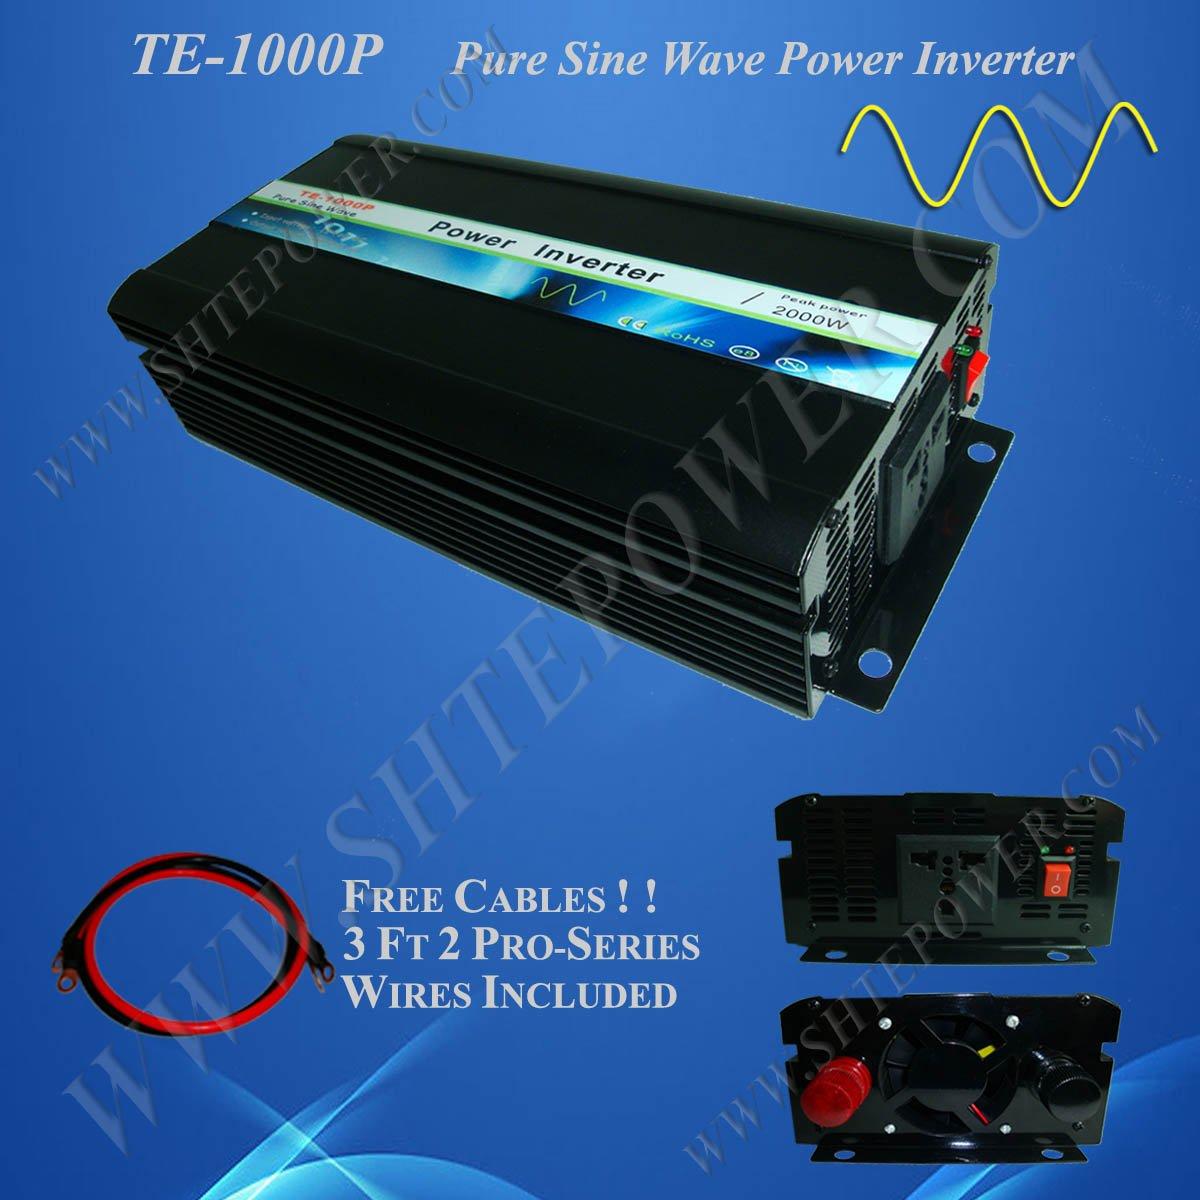 Mkp1000 122r High Level 12vdc 120vac 1000w Dc Ac Pure Sine Wave 12 Vdc 120 Vac Inverter Schematic Power 24v To 120v